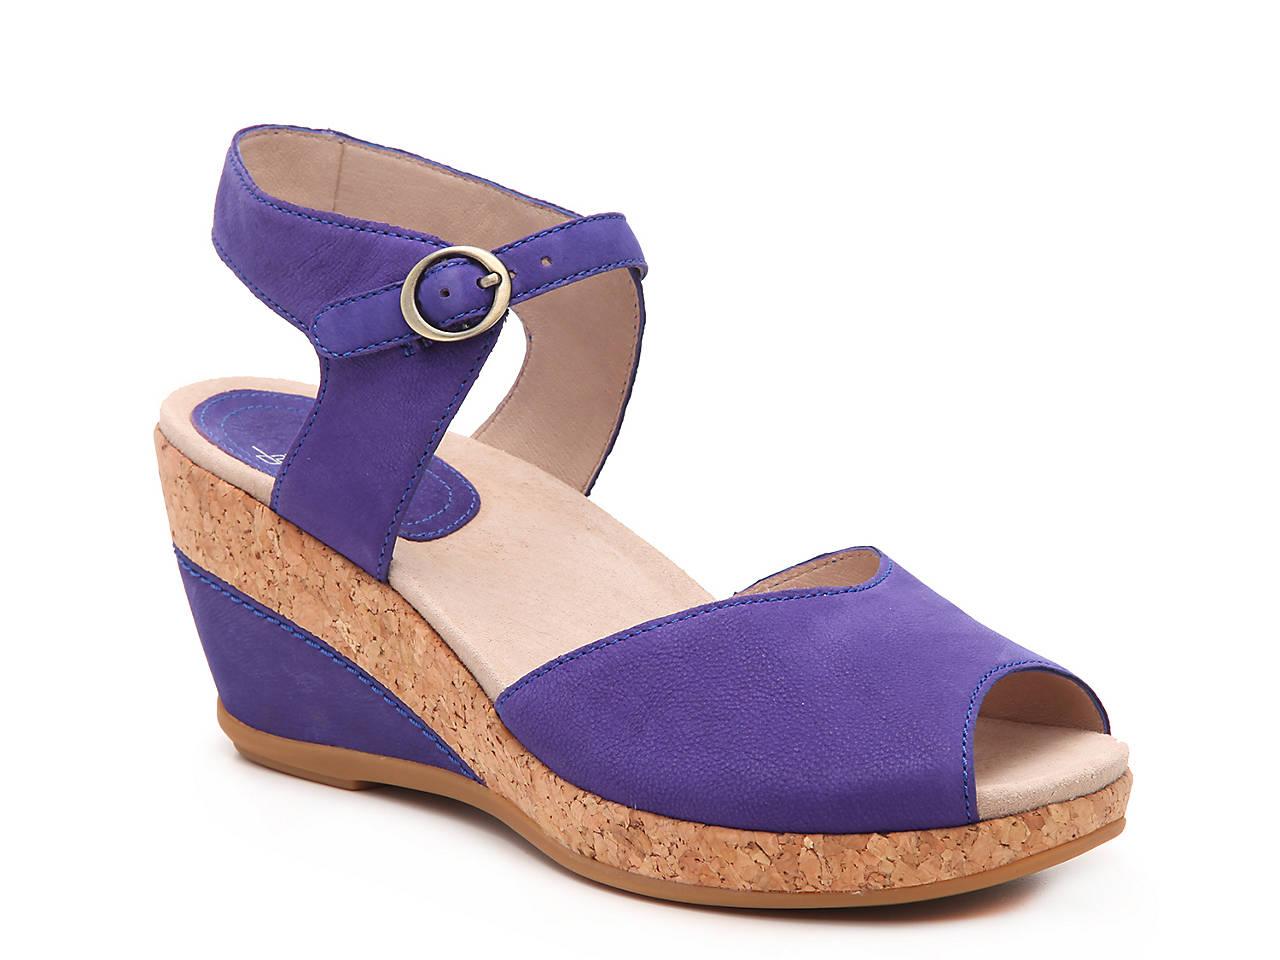 fe441d98a52 Dansko Charlotte Wedge Sandal Women s Shoes